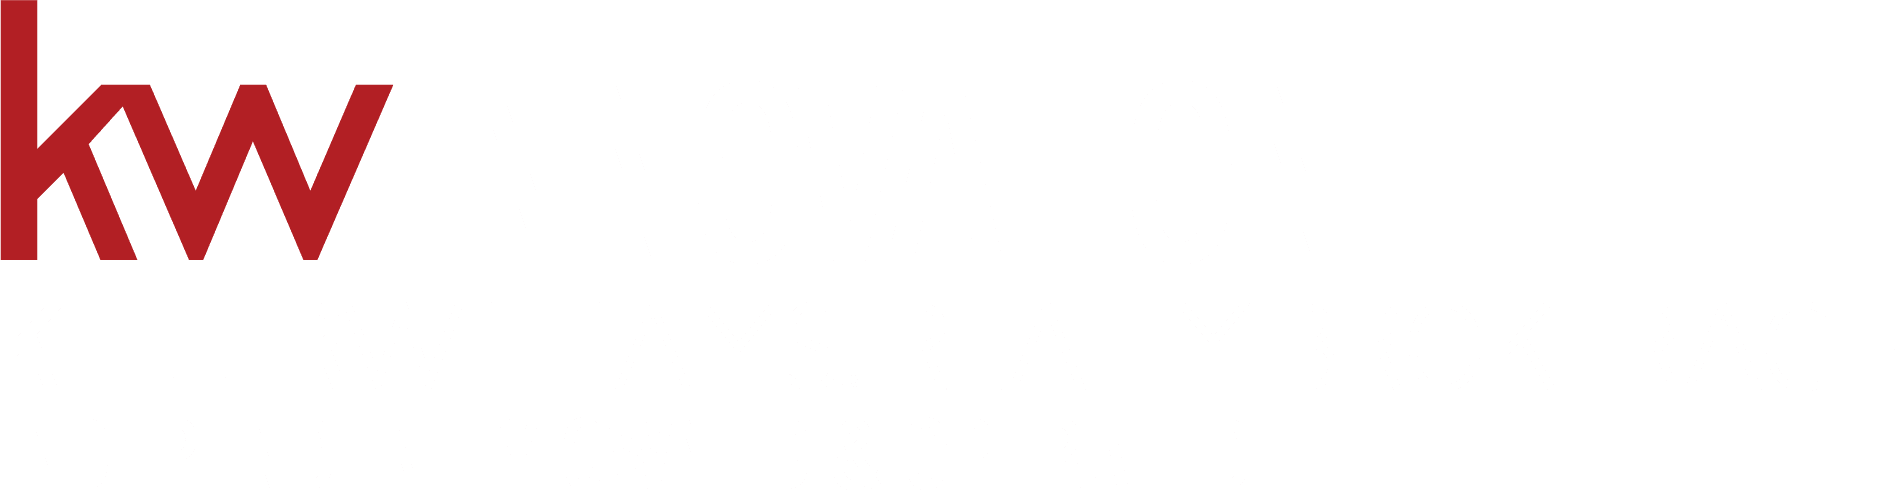 KW Innovative Realty Brokerage